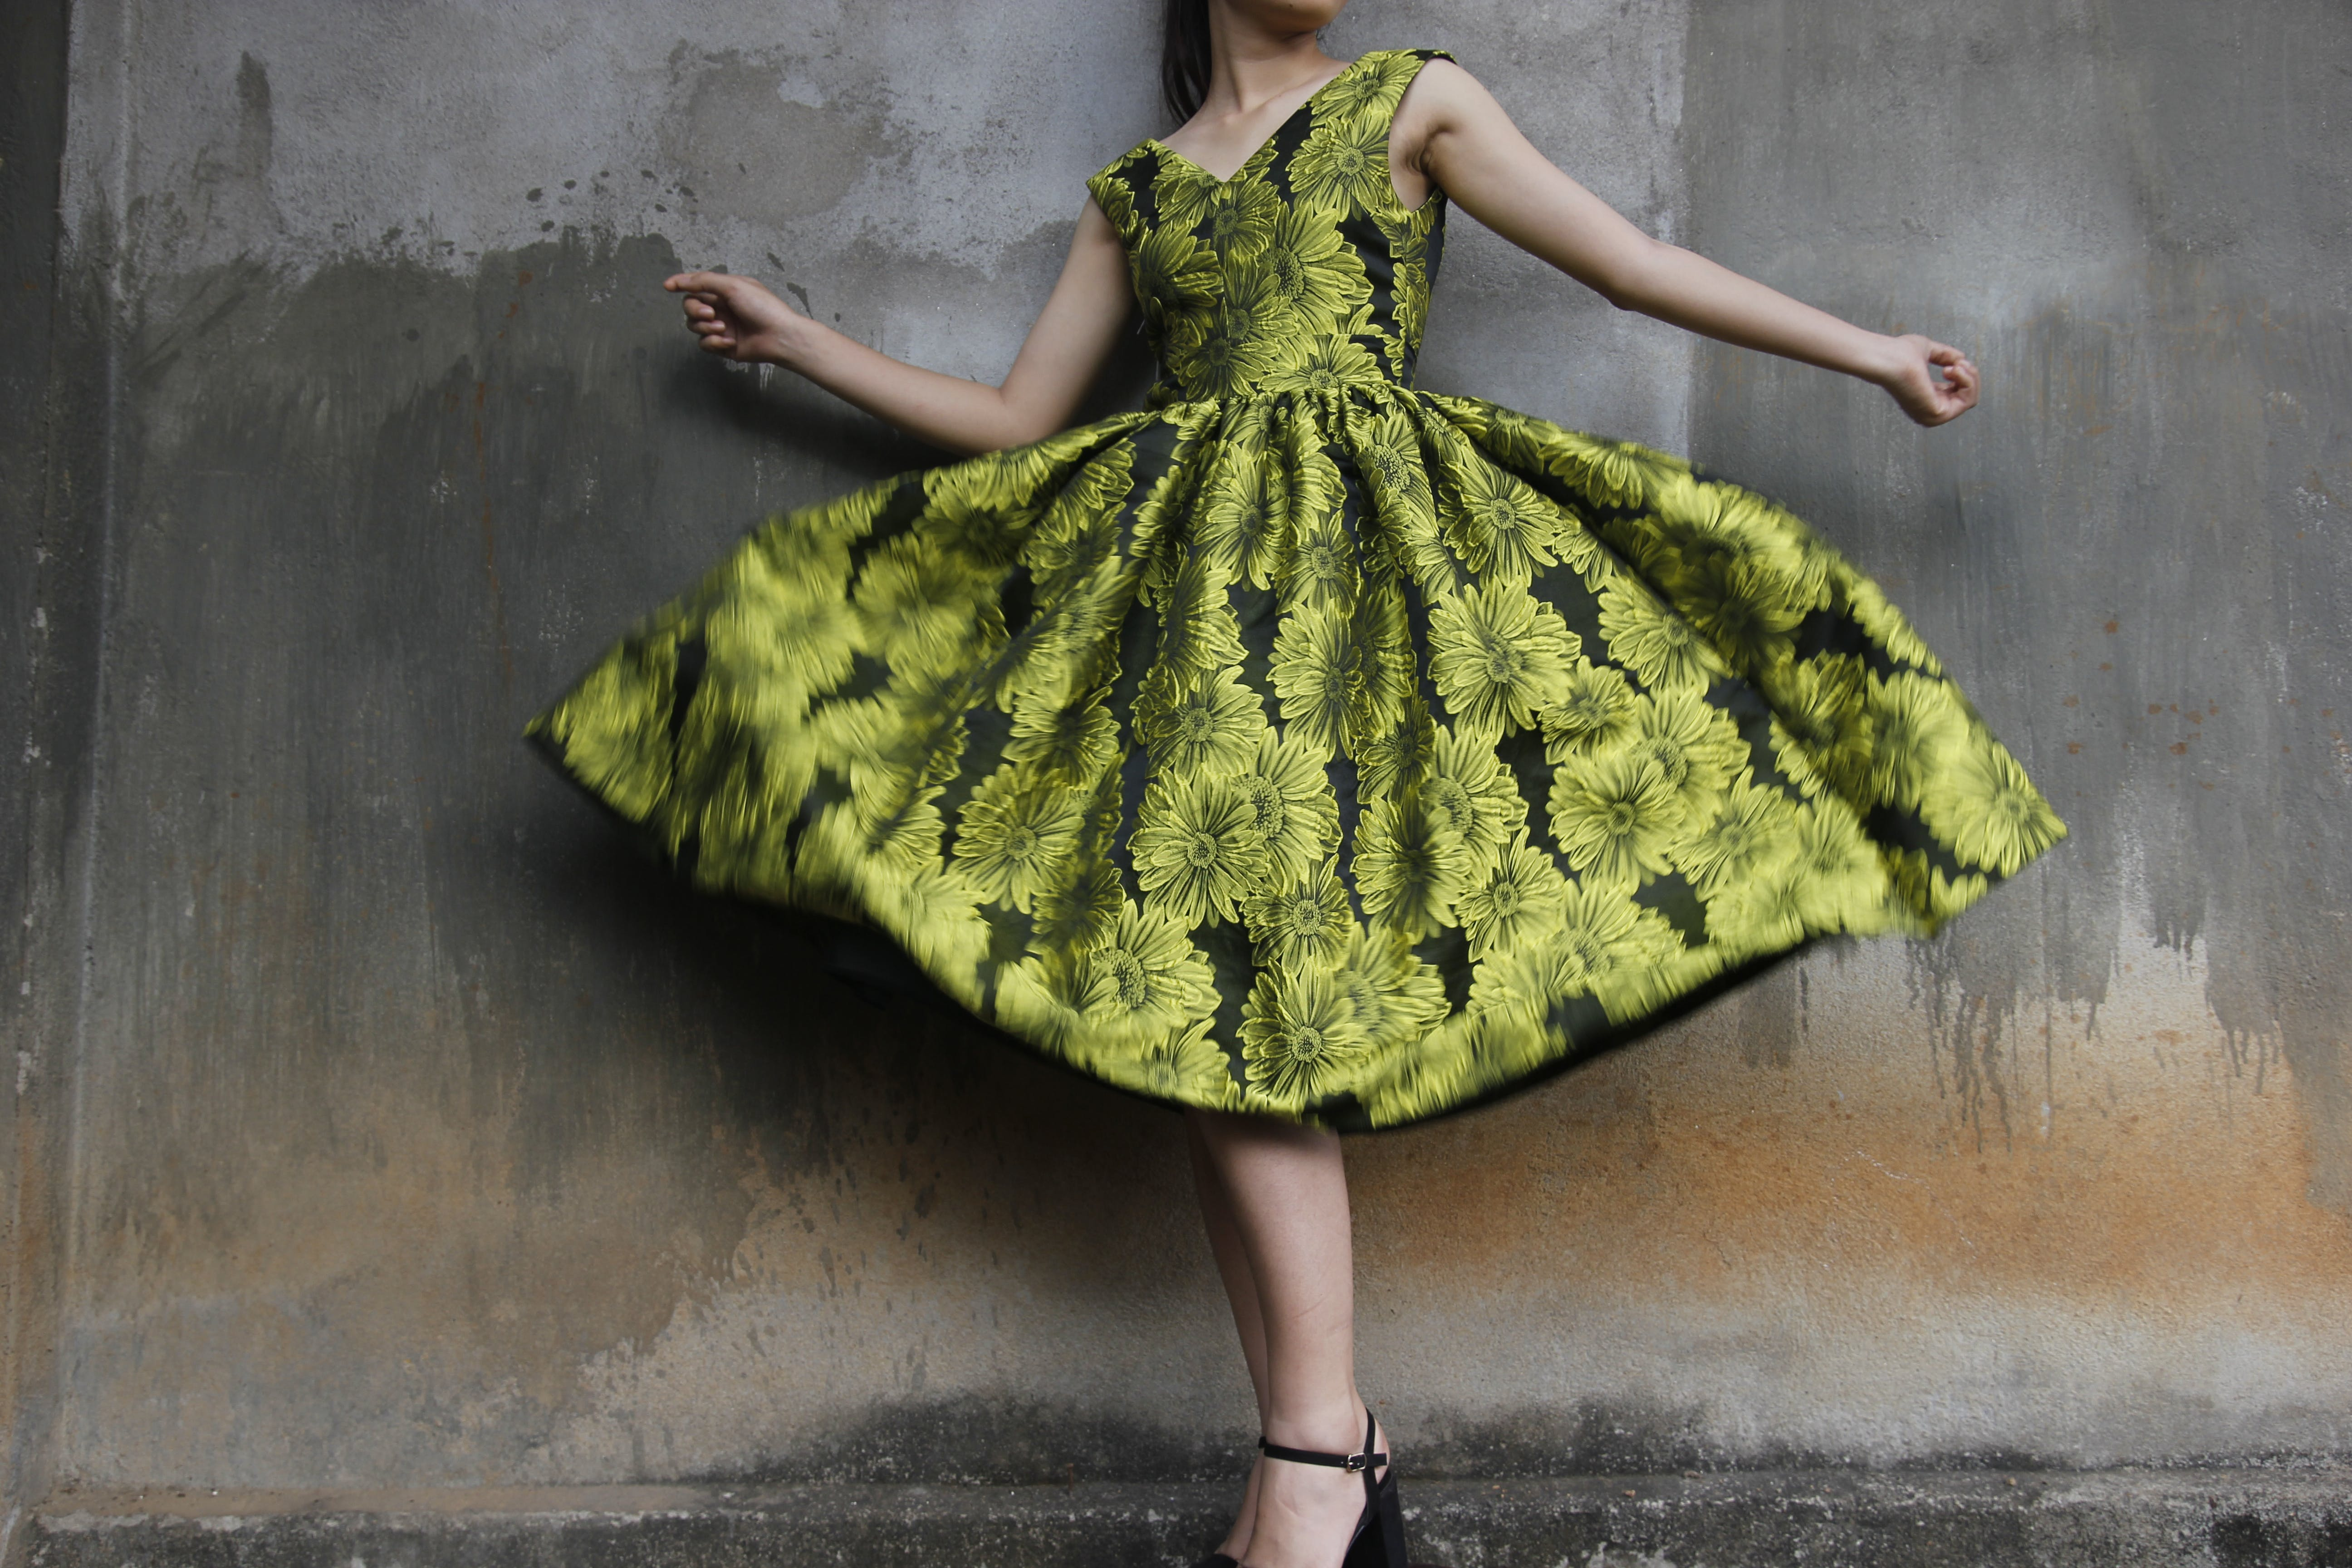 Photo of a Woman Wearing Green Dress